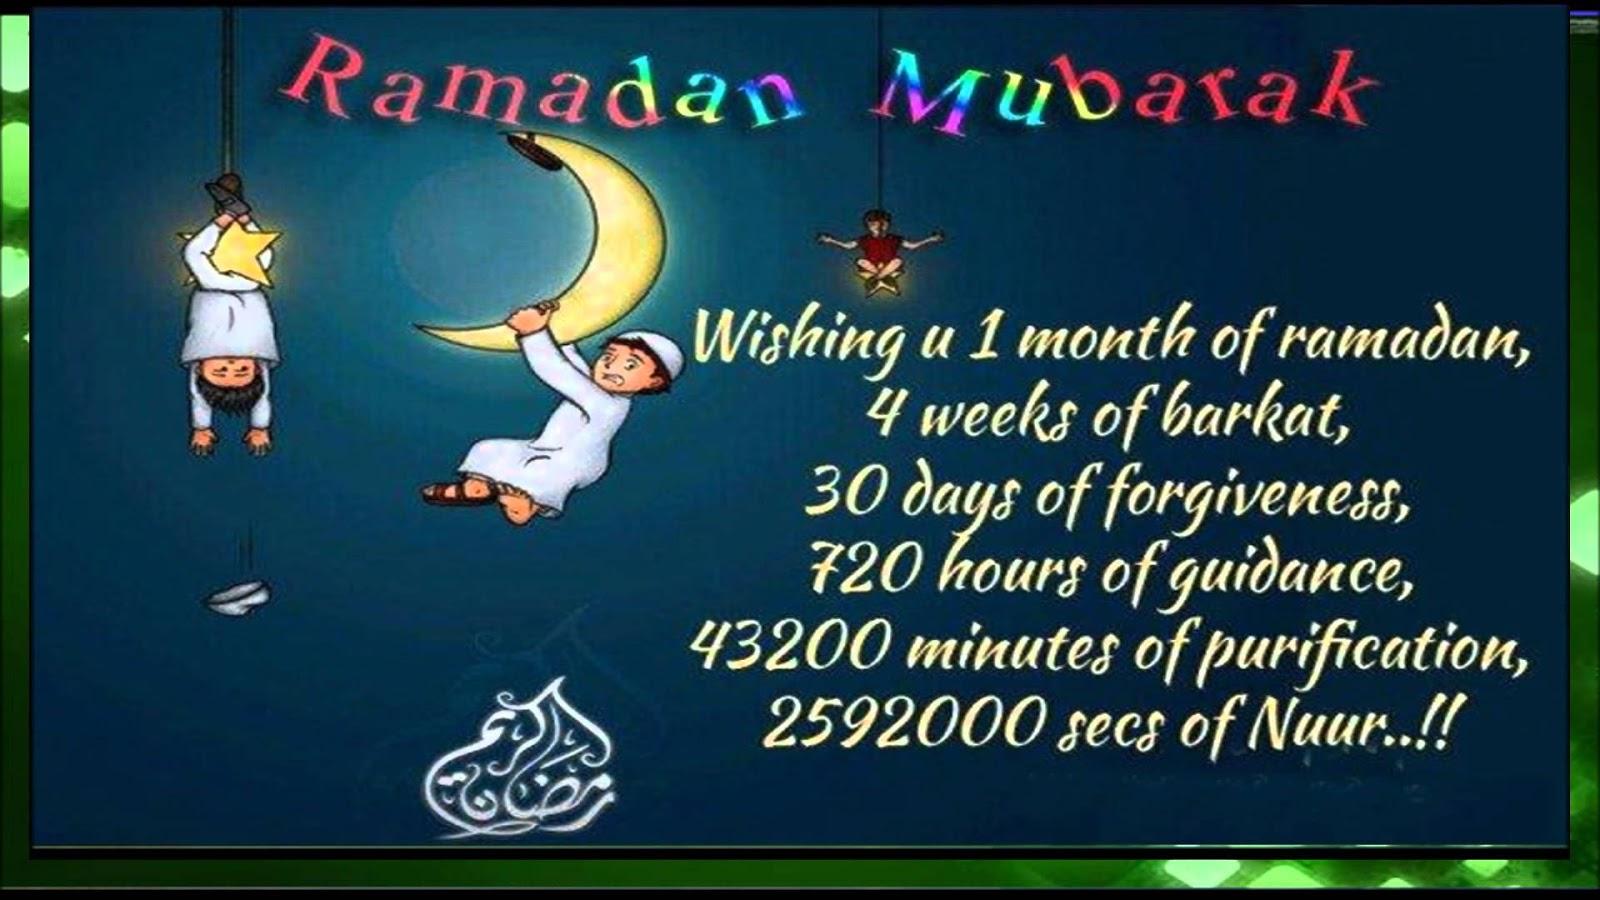 happy ramadan eid mubarak wishes images greetings status